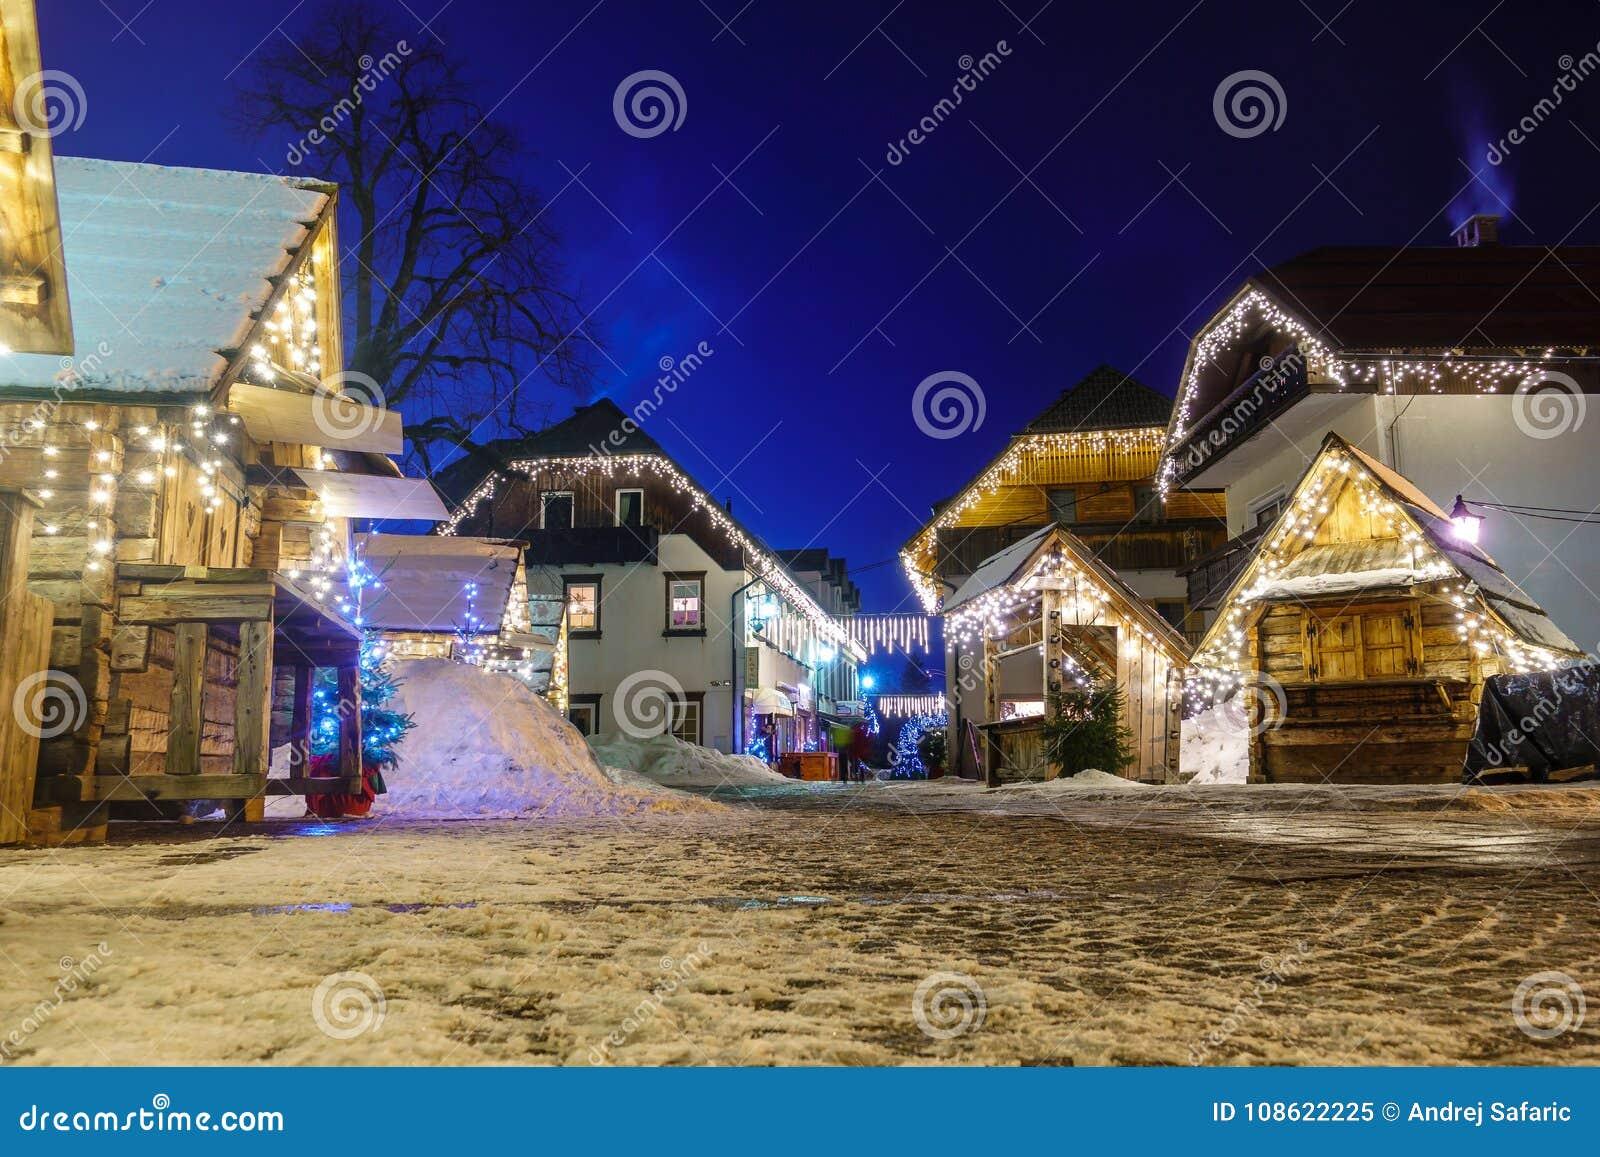 Kranjska Gora Christmas Decorated Square, Alpine village by night